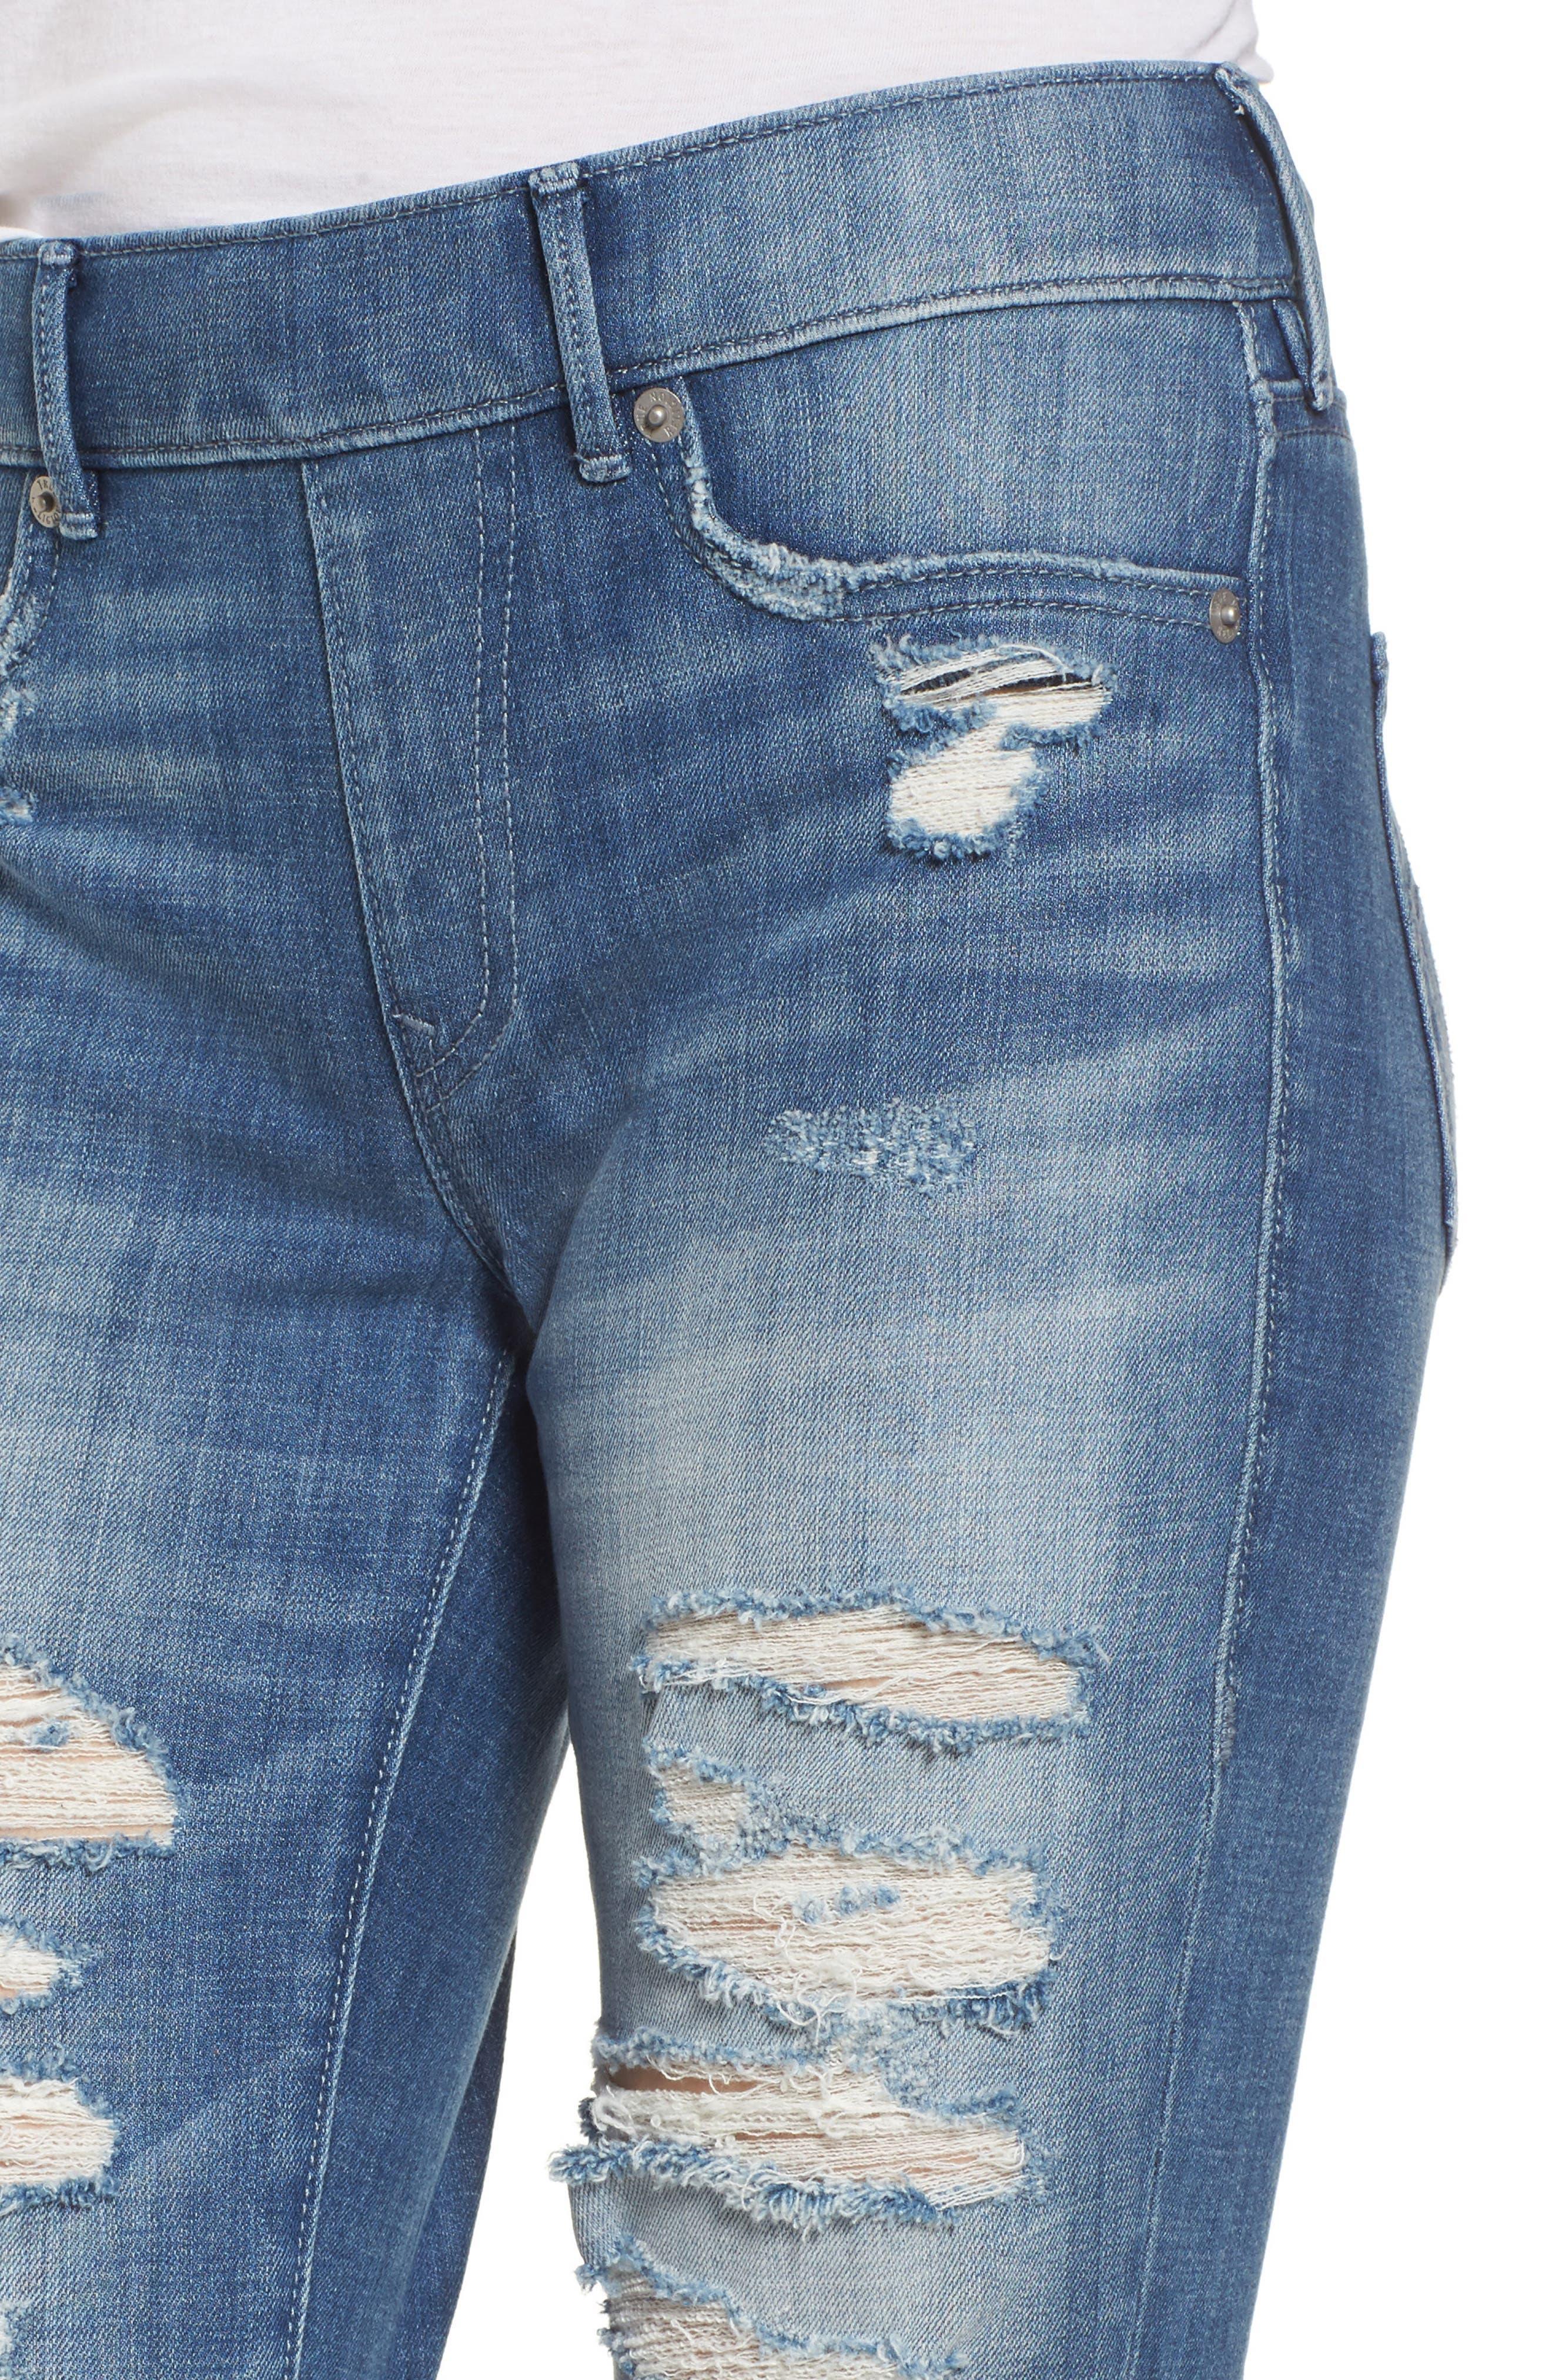 Jennie Runaway Legging Jeans,                             Alternate thumbnail 4, color,                             401